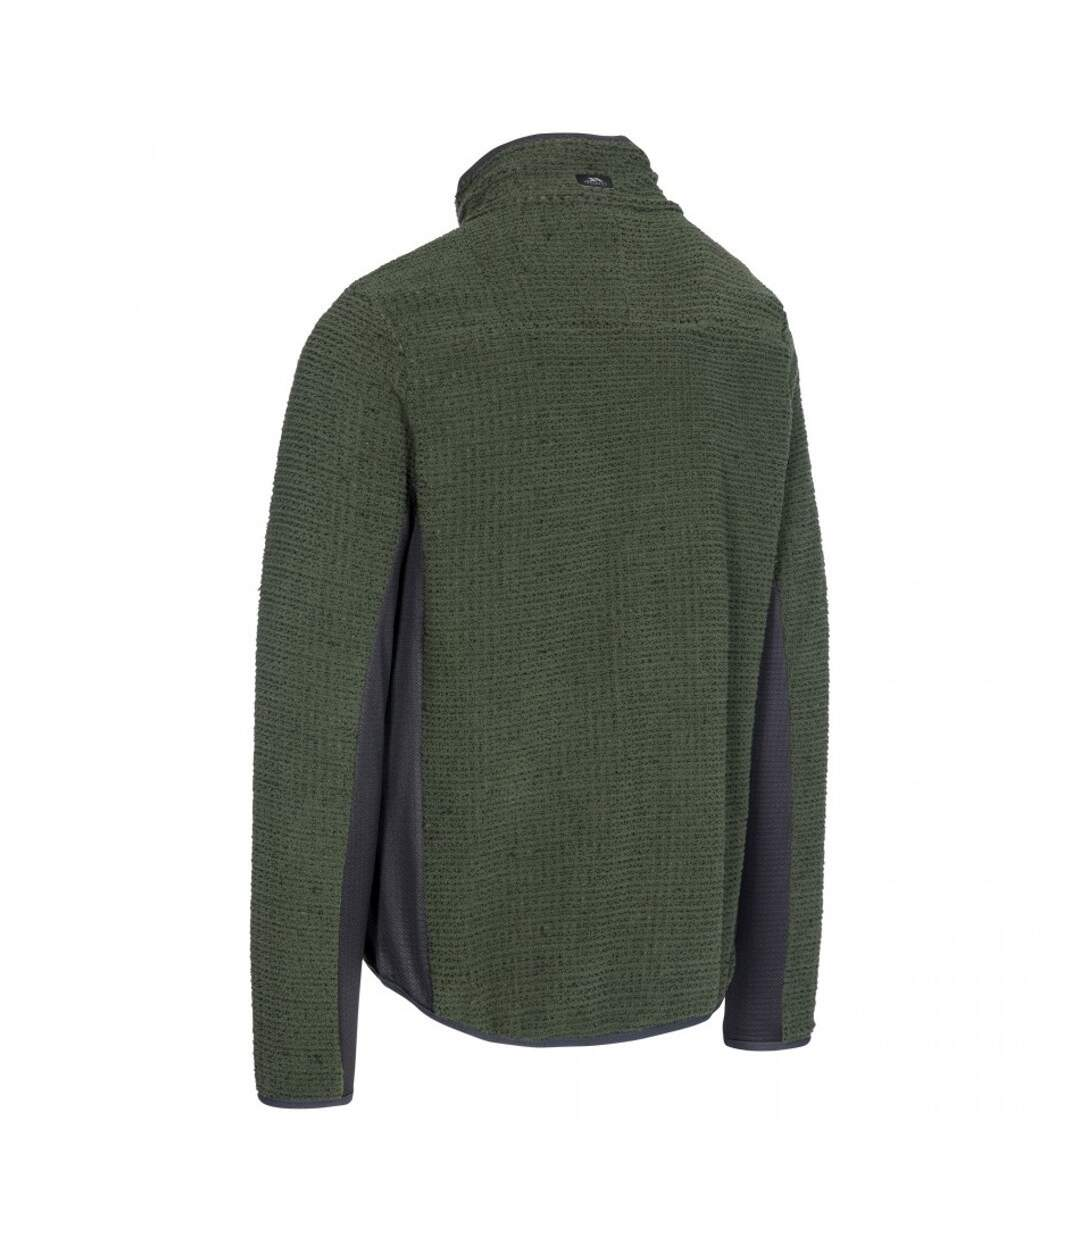 Trespass Mens Templetonpeck Fleece Jacket (Thyme) - UTTP4446